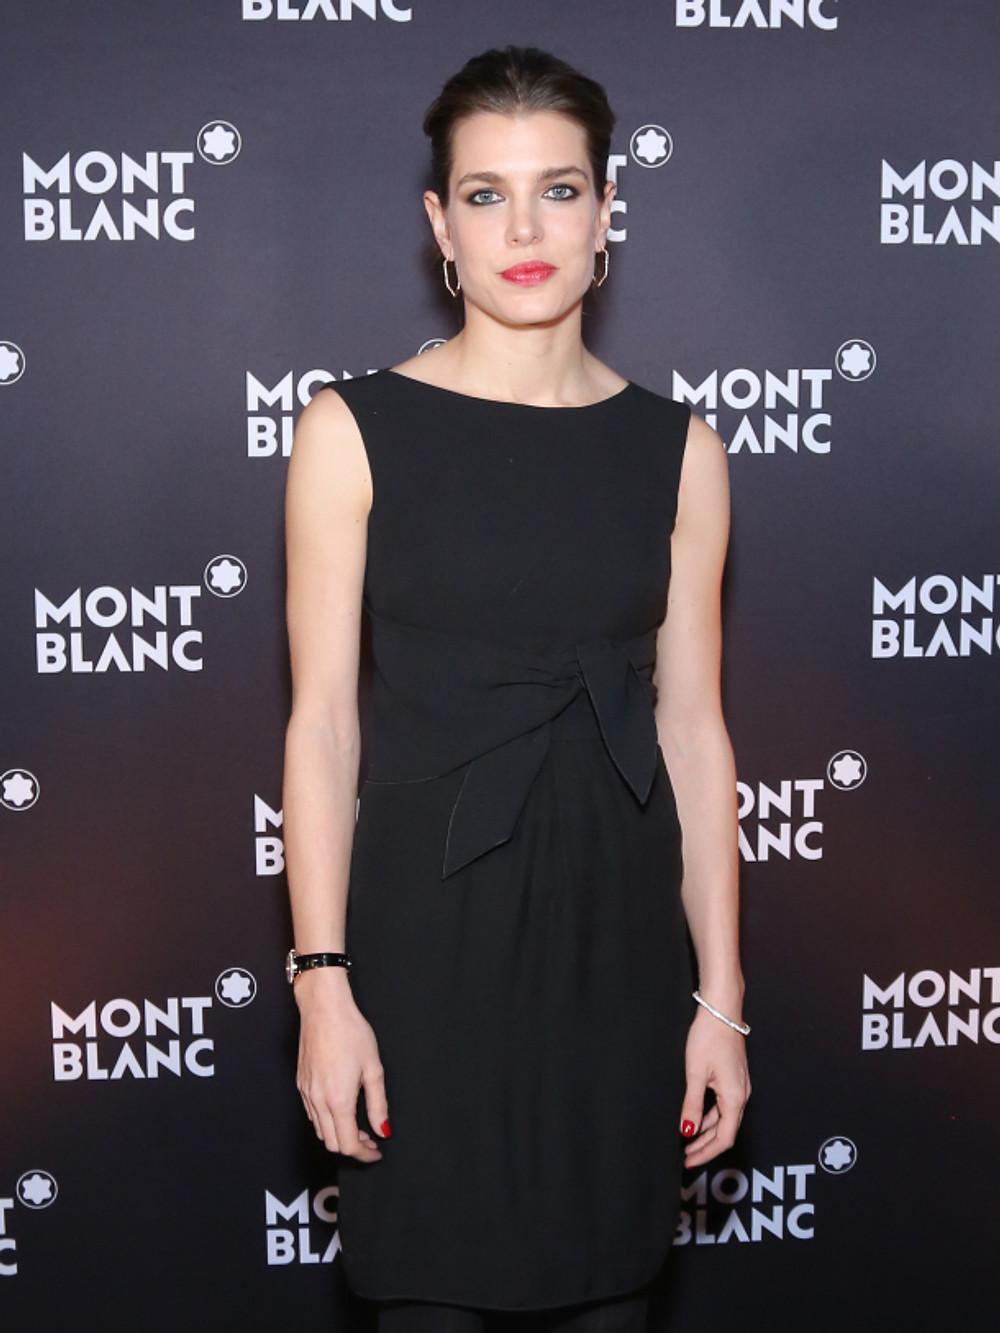 Charlotte Casiraghi, nouvelle Ambassadrice de Montblanc.